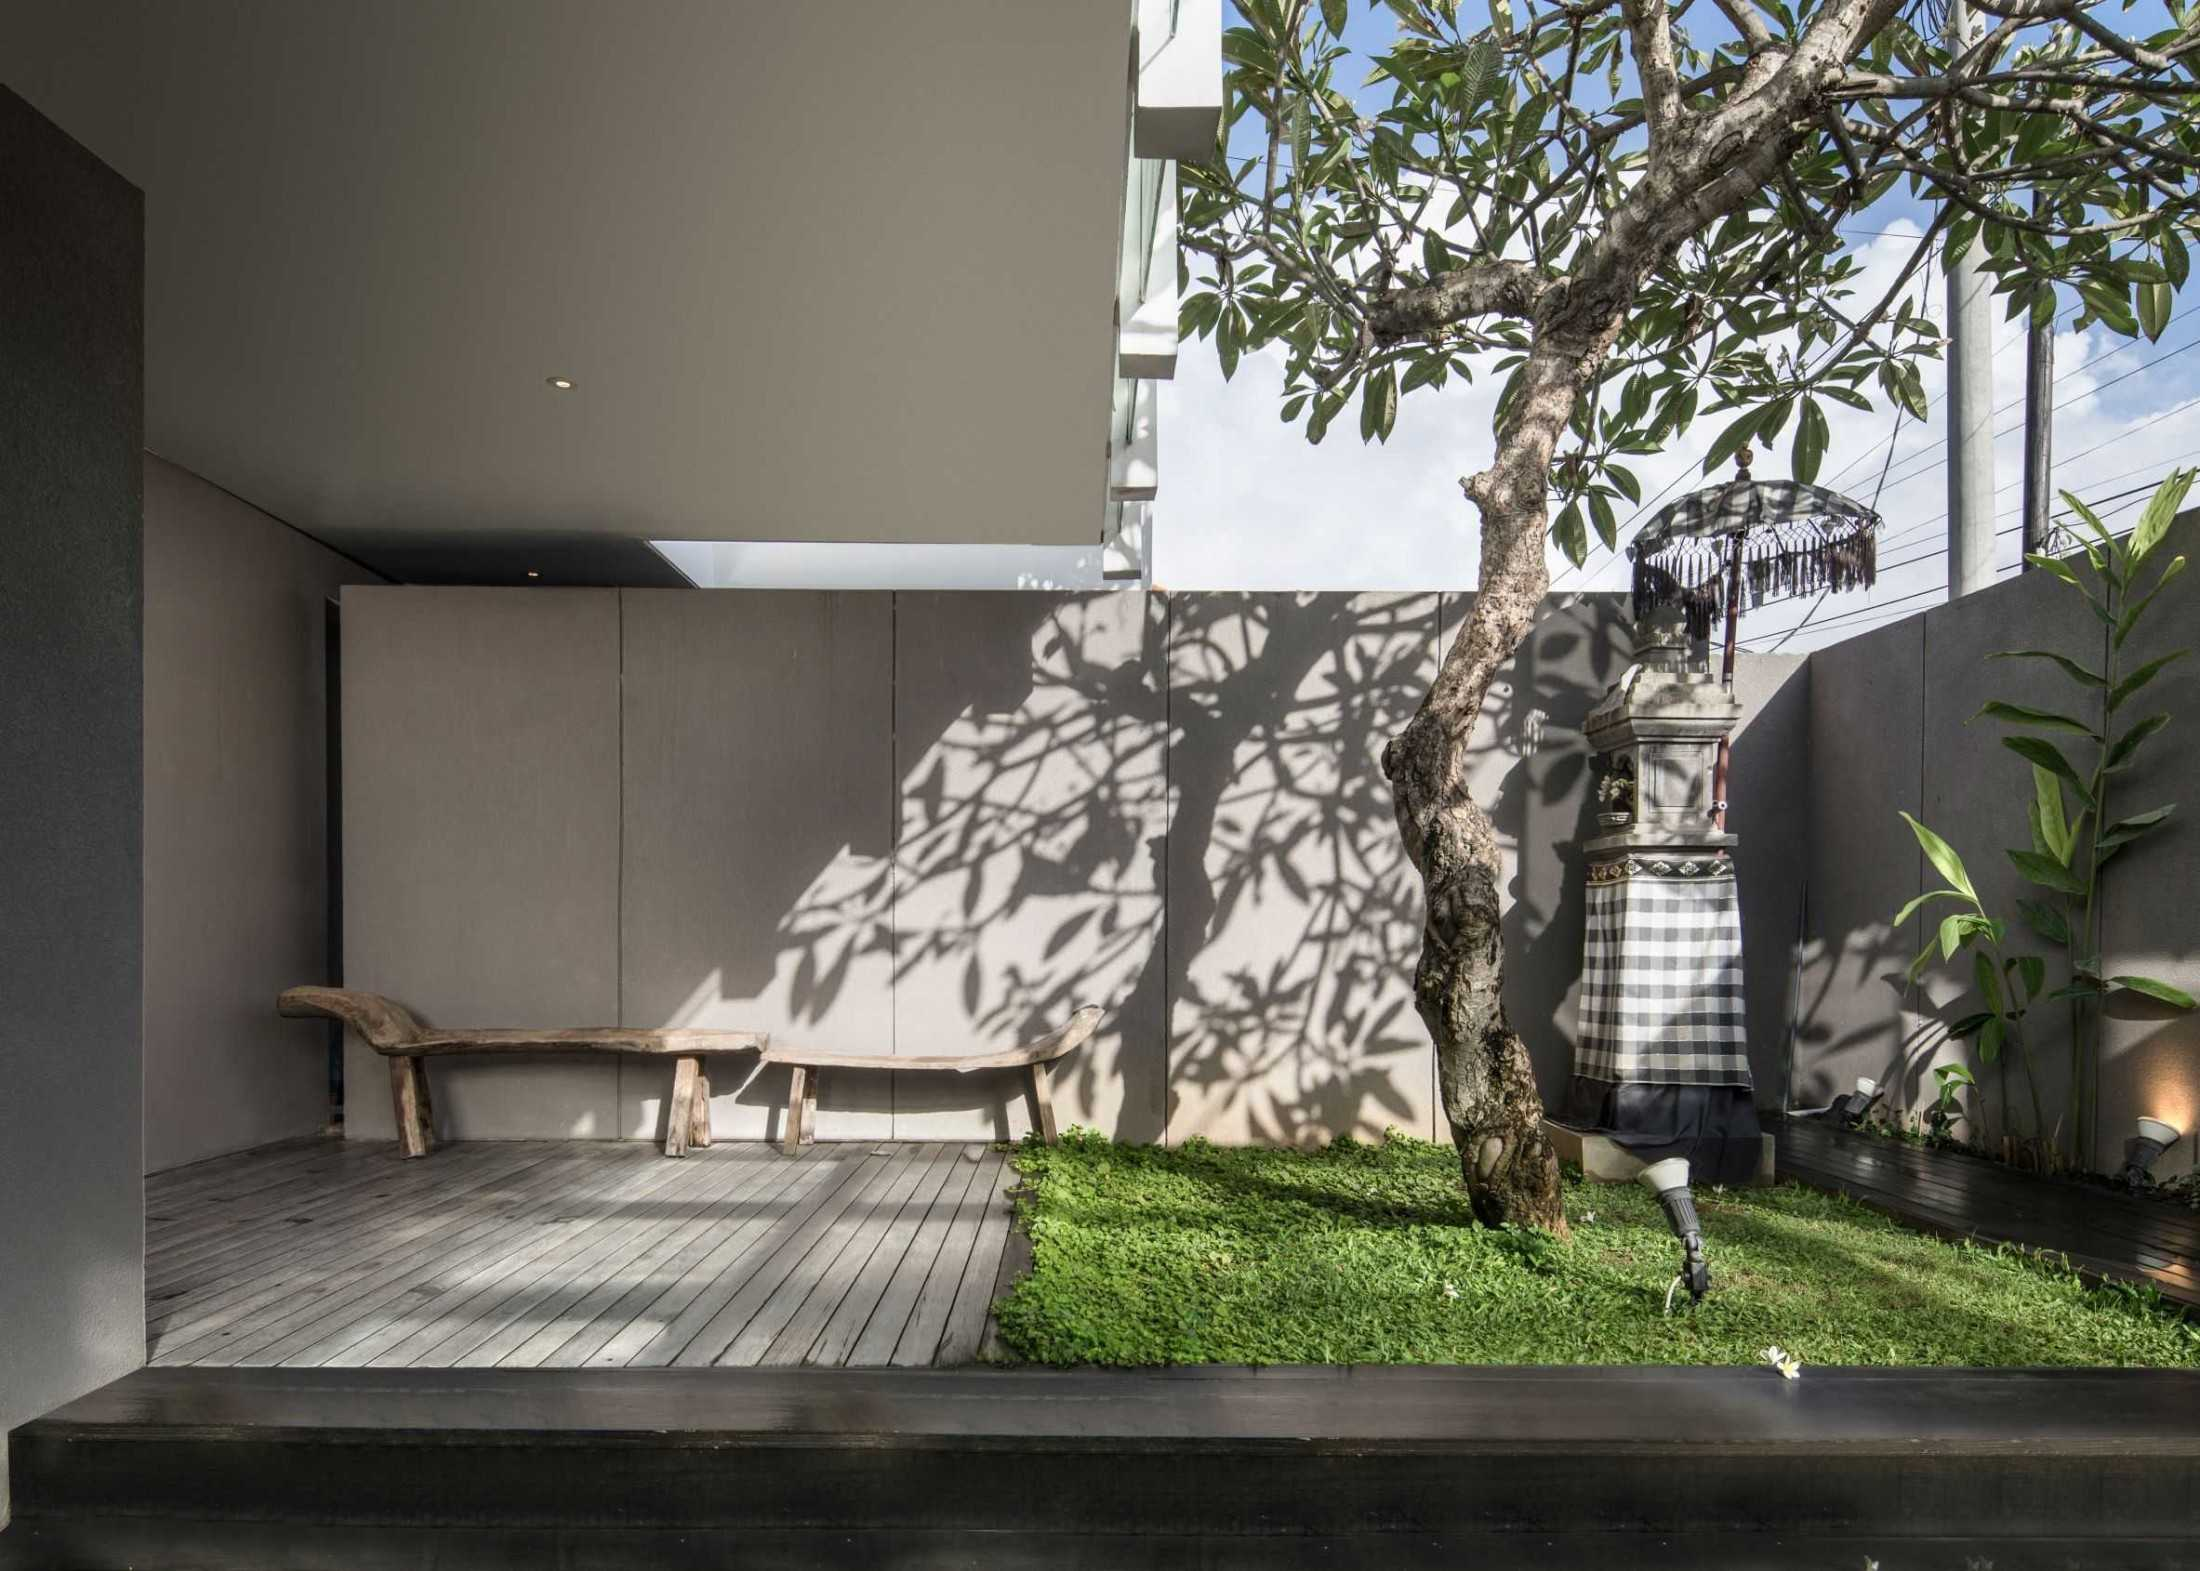 Hadivincent Architects Yy Residence Kota Denpasar, Bali, Indonesia Kota Denpasar, Bali, Indonesia Hadivincent-Architects-Yy-House  75720